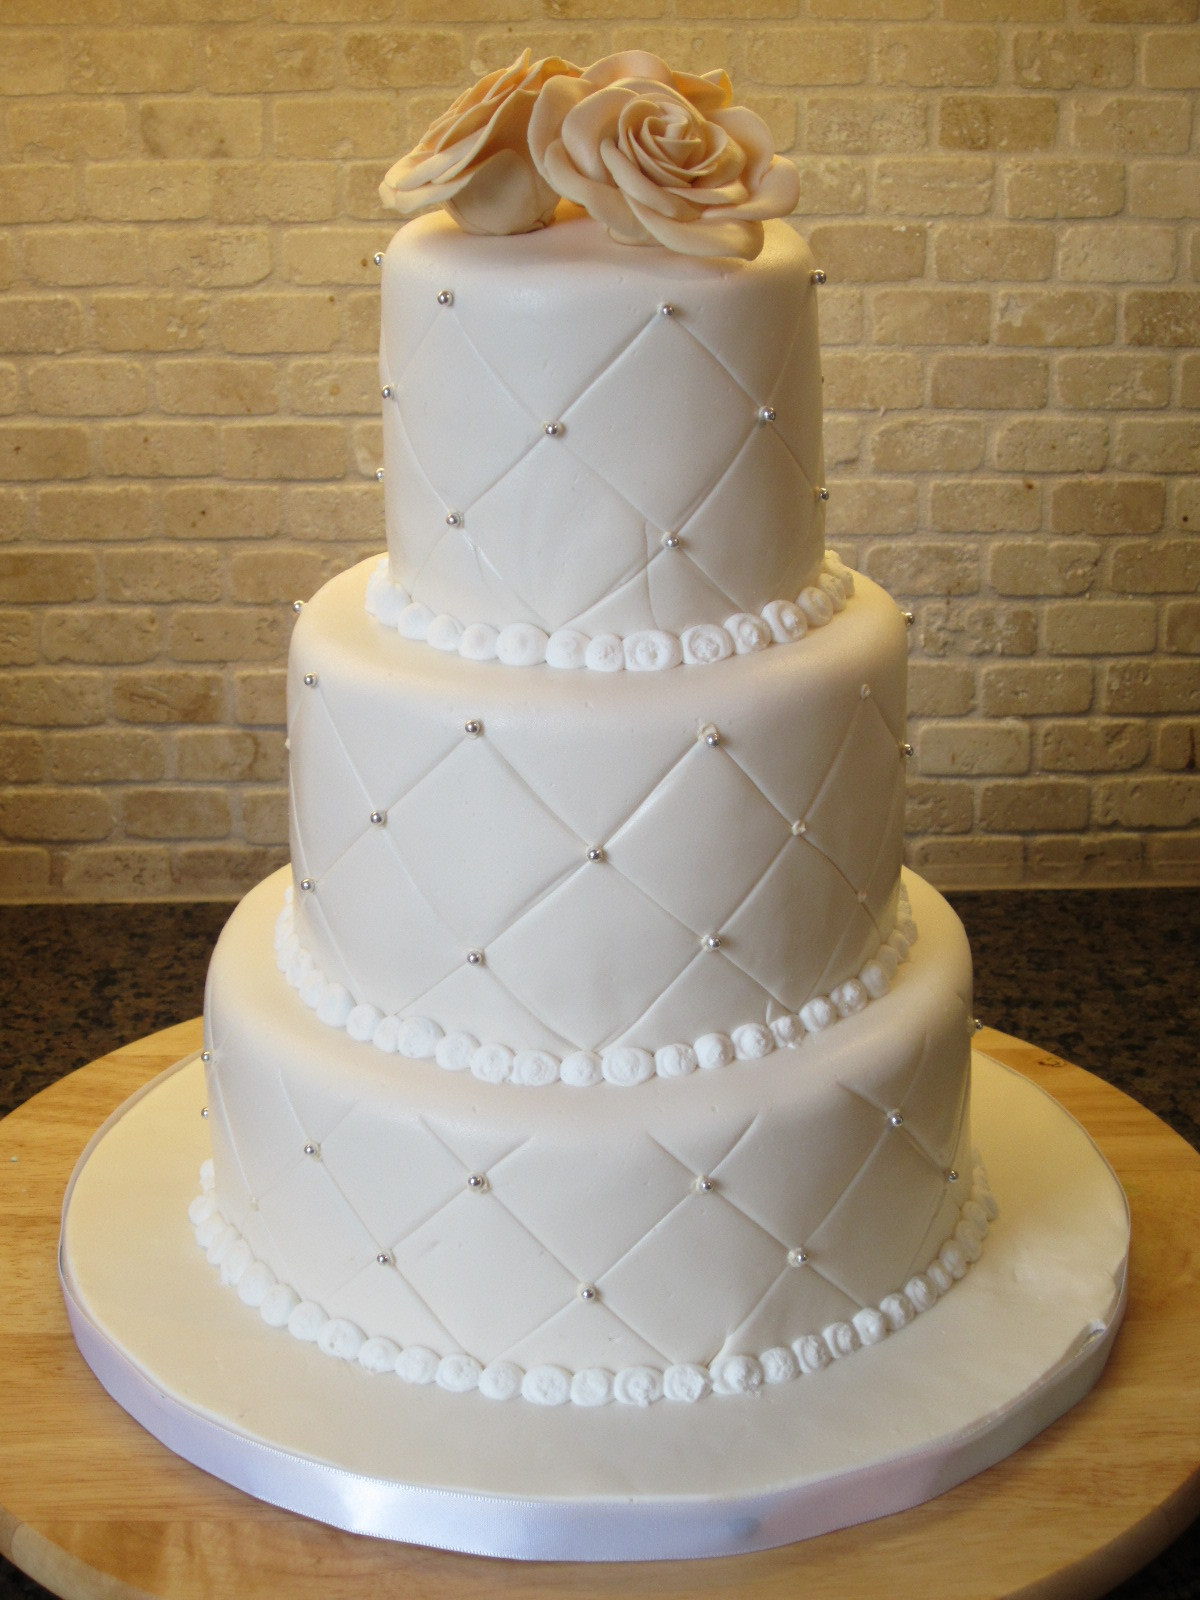 Images Of Wedding Cakes  White Pearl Wedding Cake Has Wedding Cakes Ideas on with